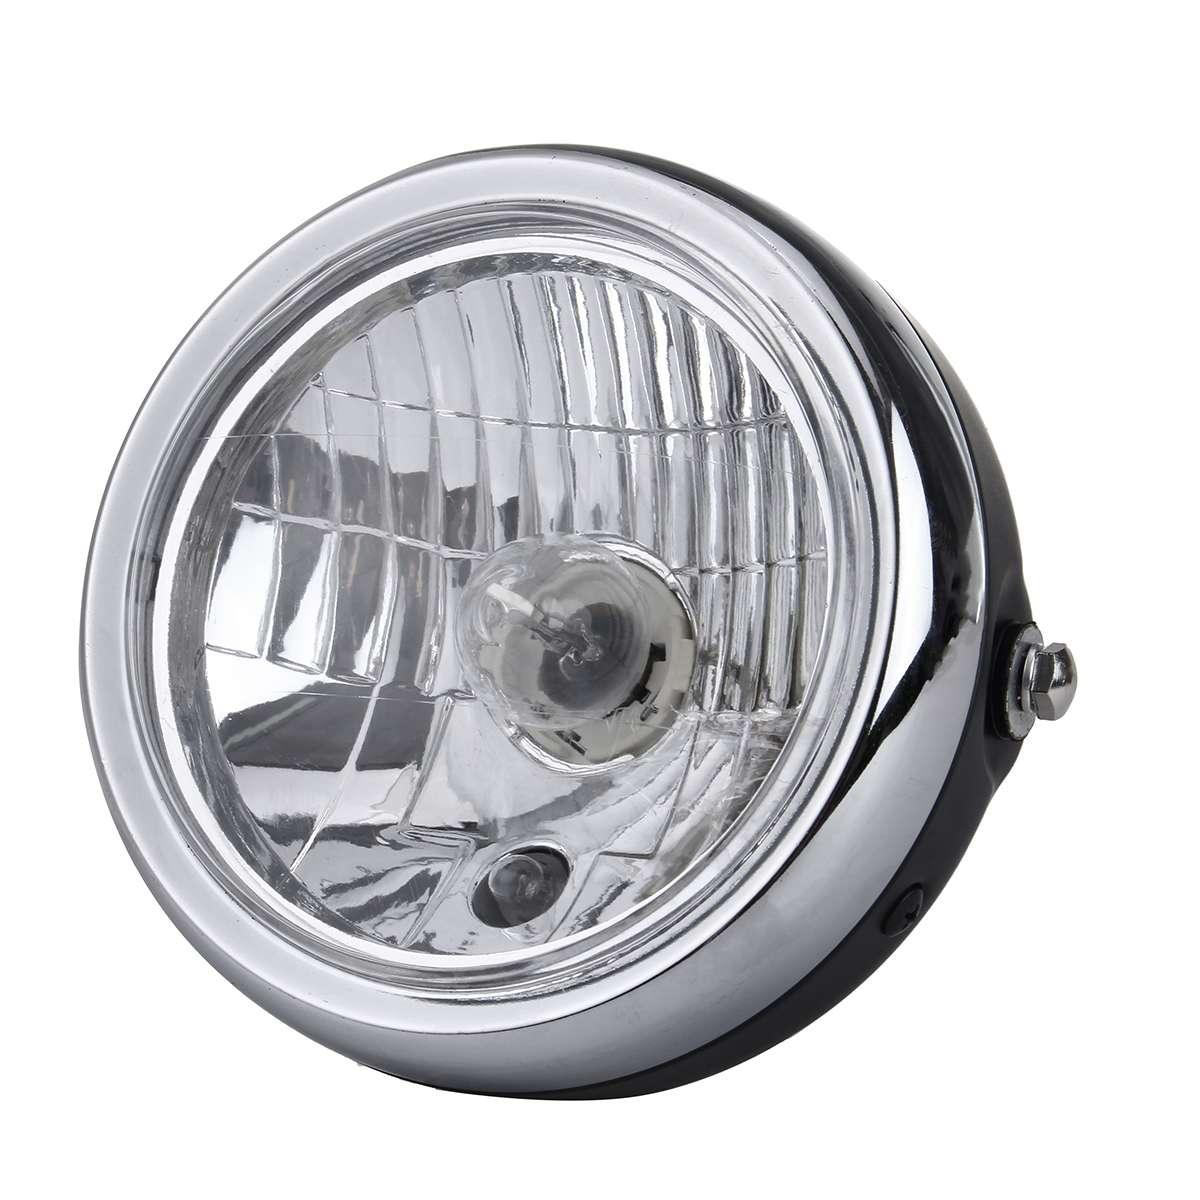 Retro Metal 6 Inch 35W 12V Universal Motorcycle Headlight H4 HID Hi/Lo Beam Light Lamp Fog Lamp Side Mount Round Motor Headlamp